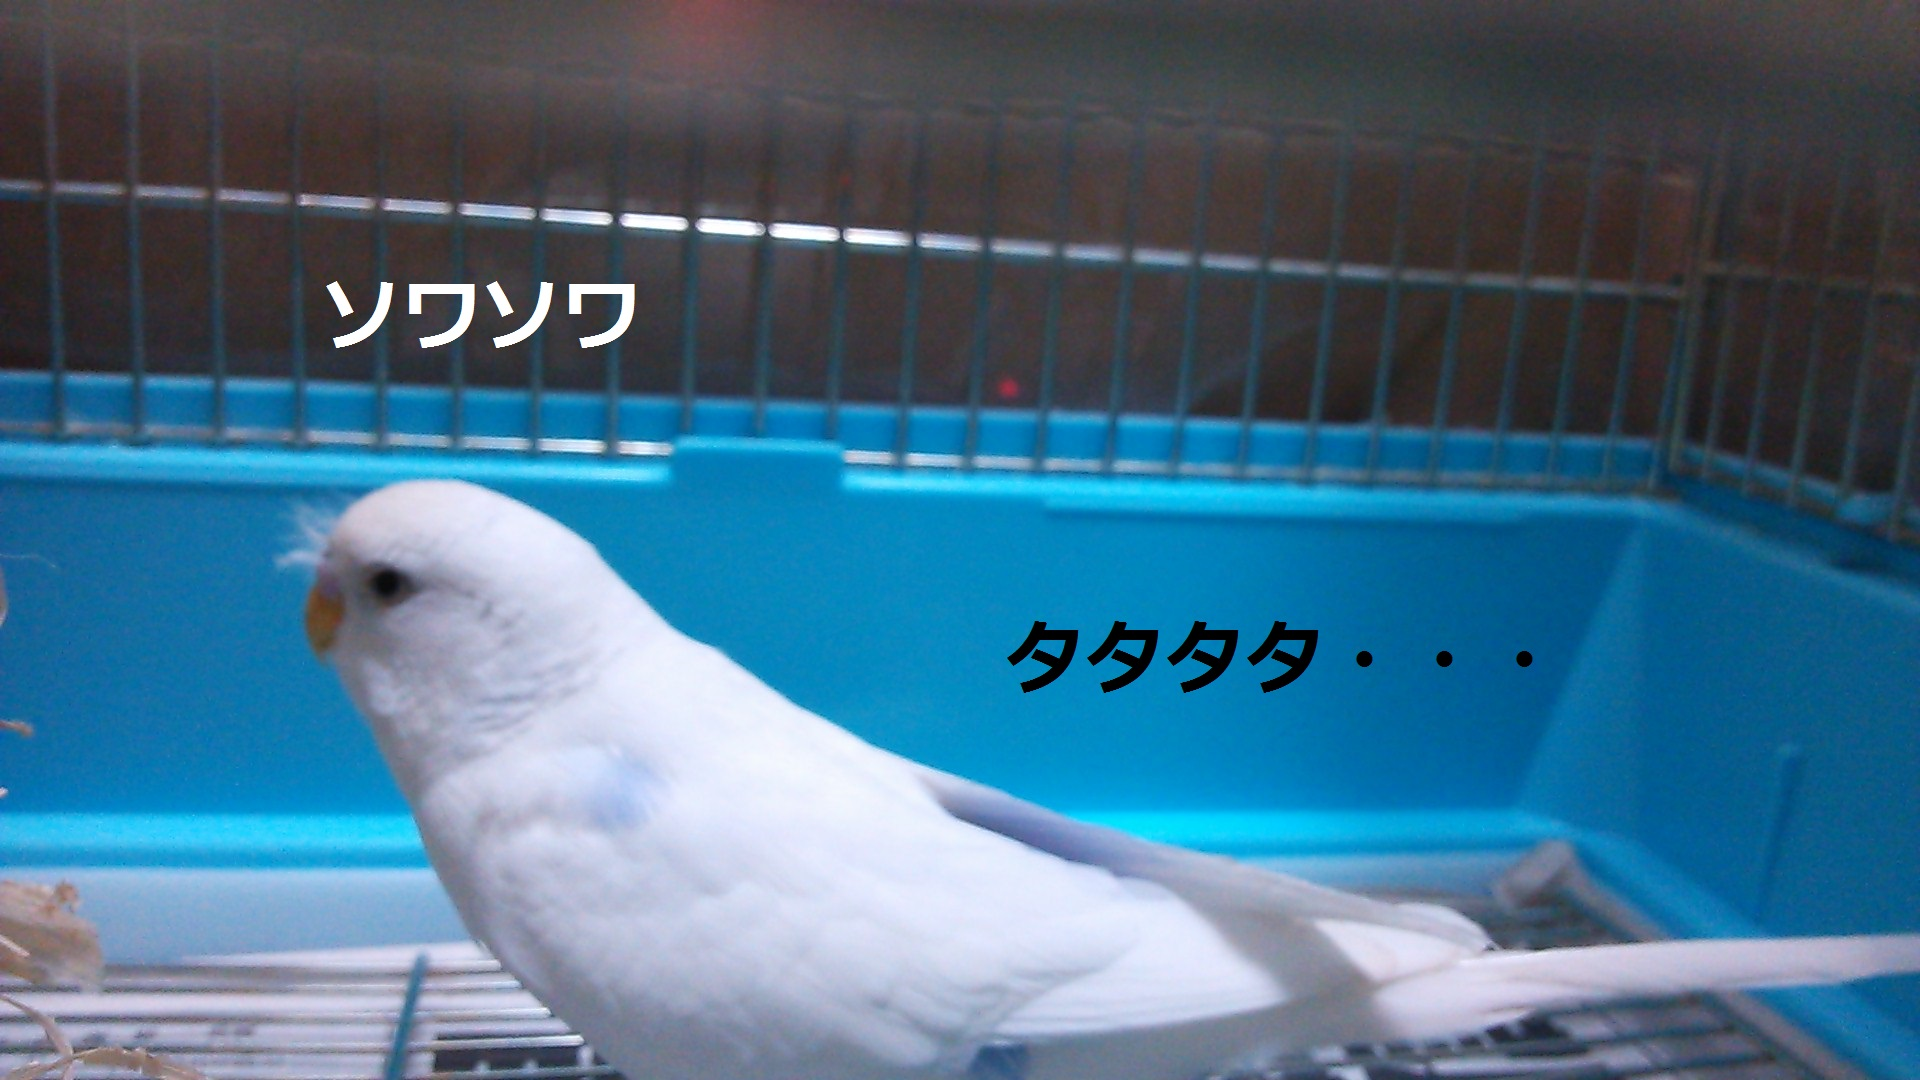 c0322903_00013417.jpg